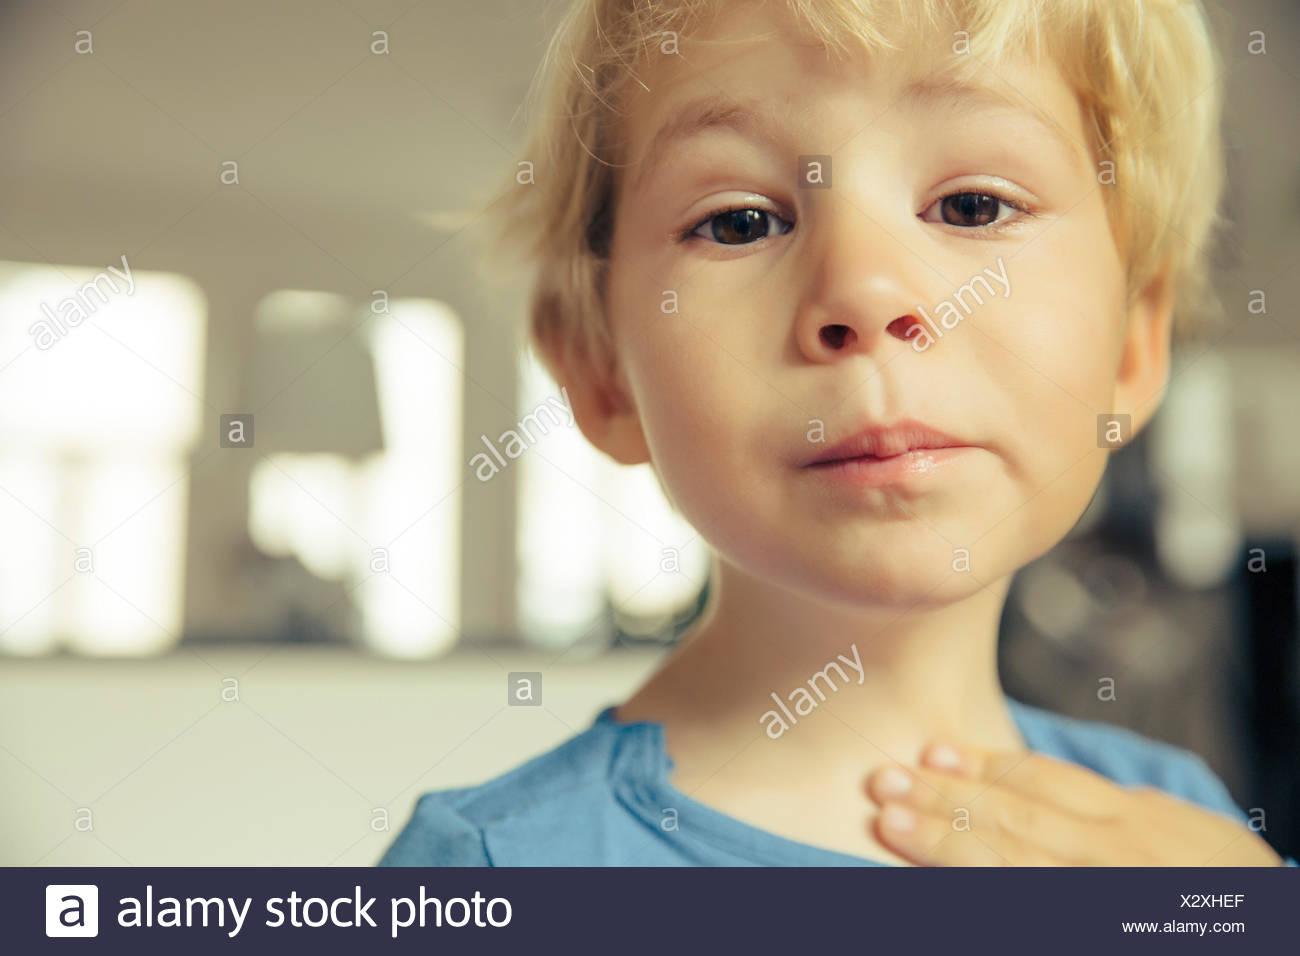 Portrait of little boy having sore throat - Stock Image